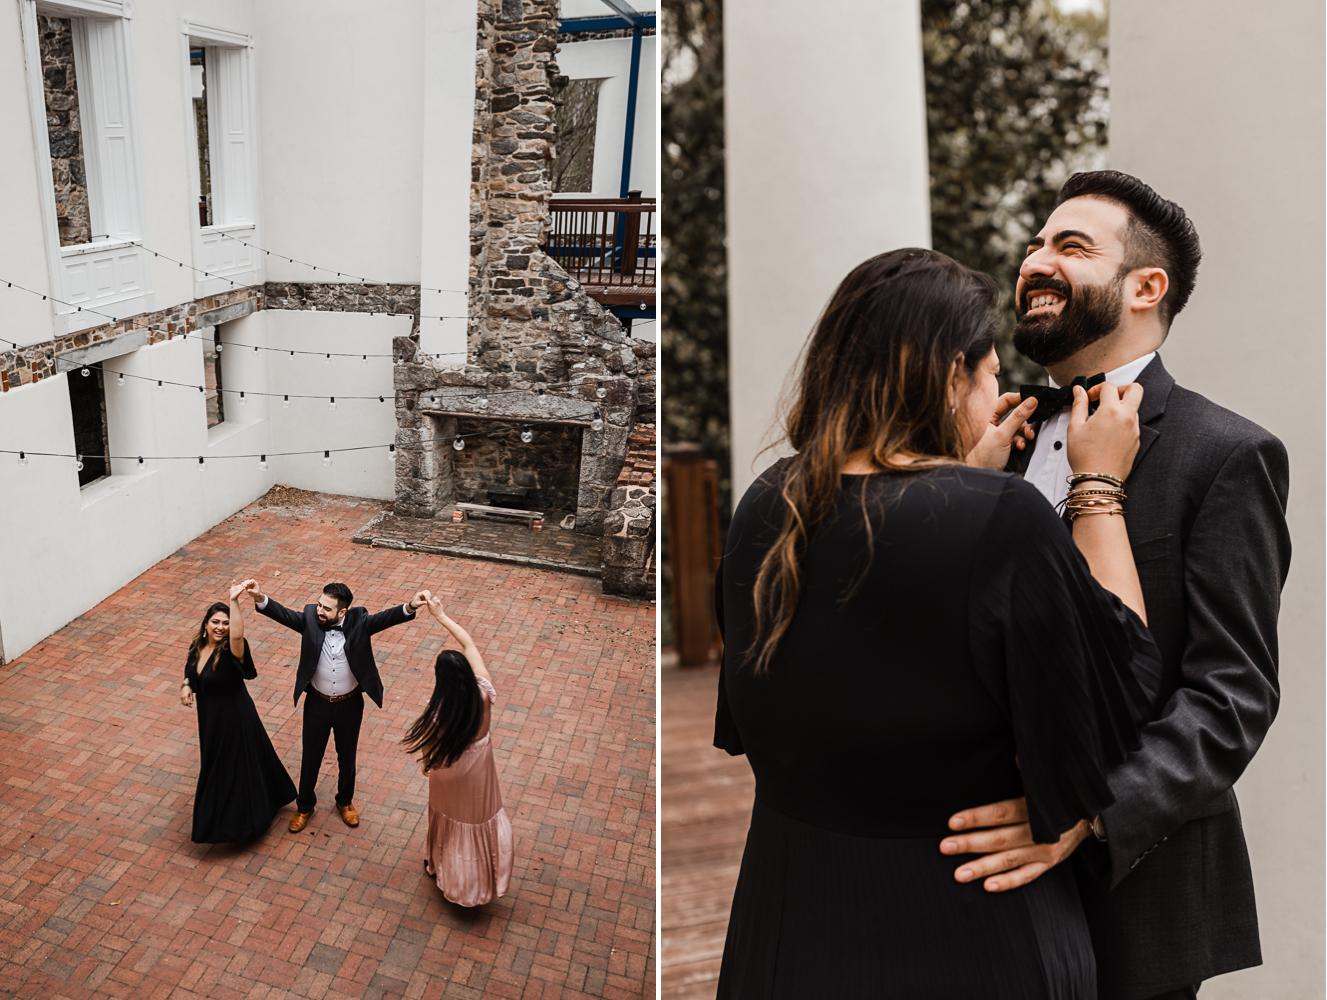 Polyamorous relationship at Patapsco Female Institute by Barbara O Photography03.jpg